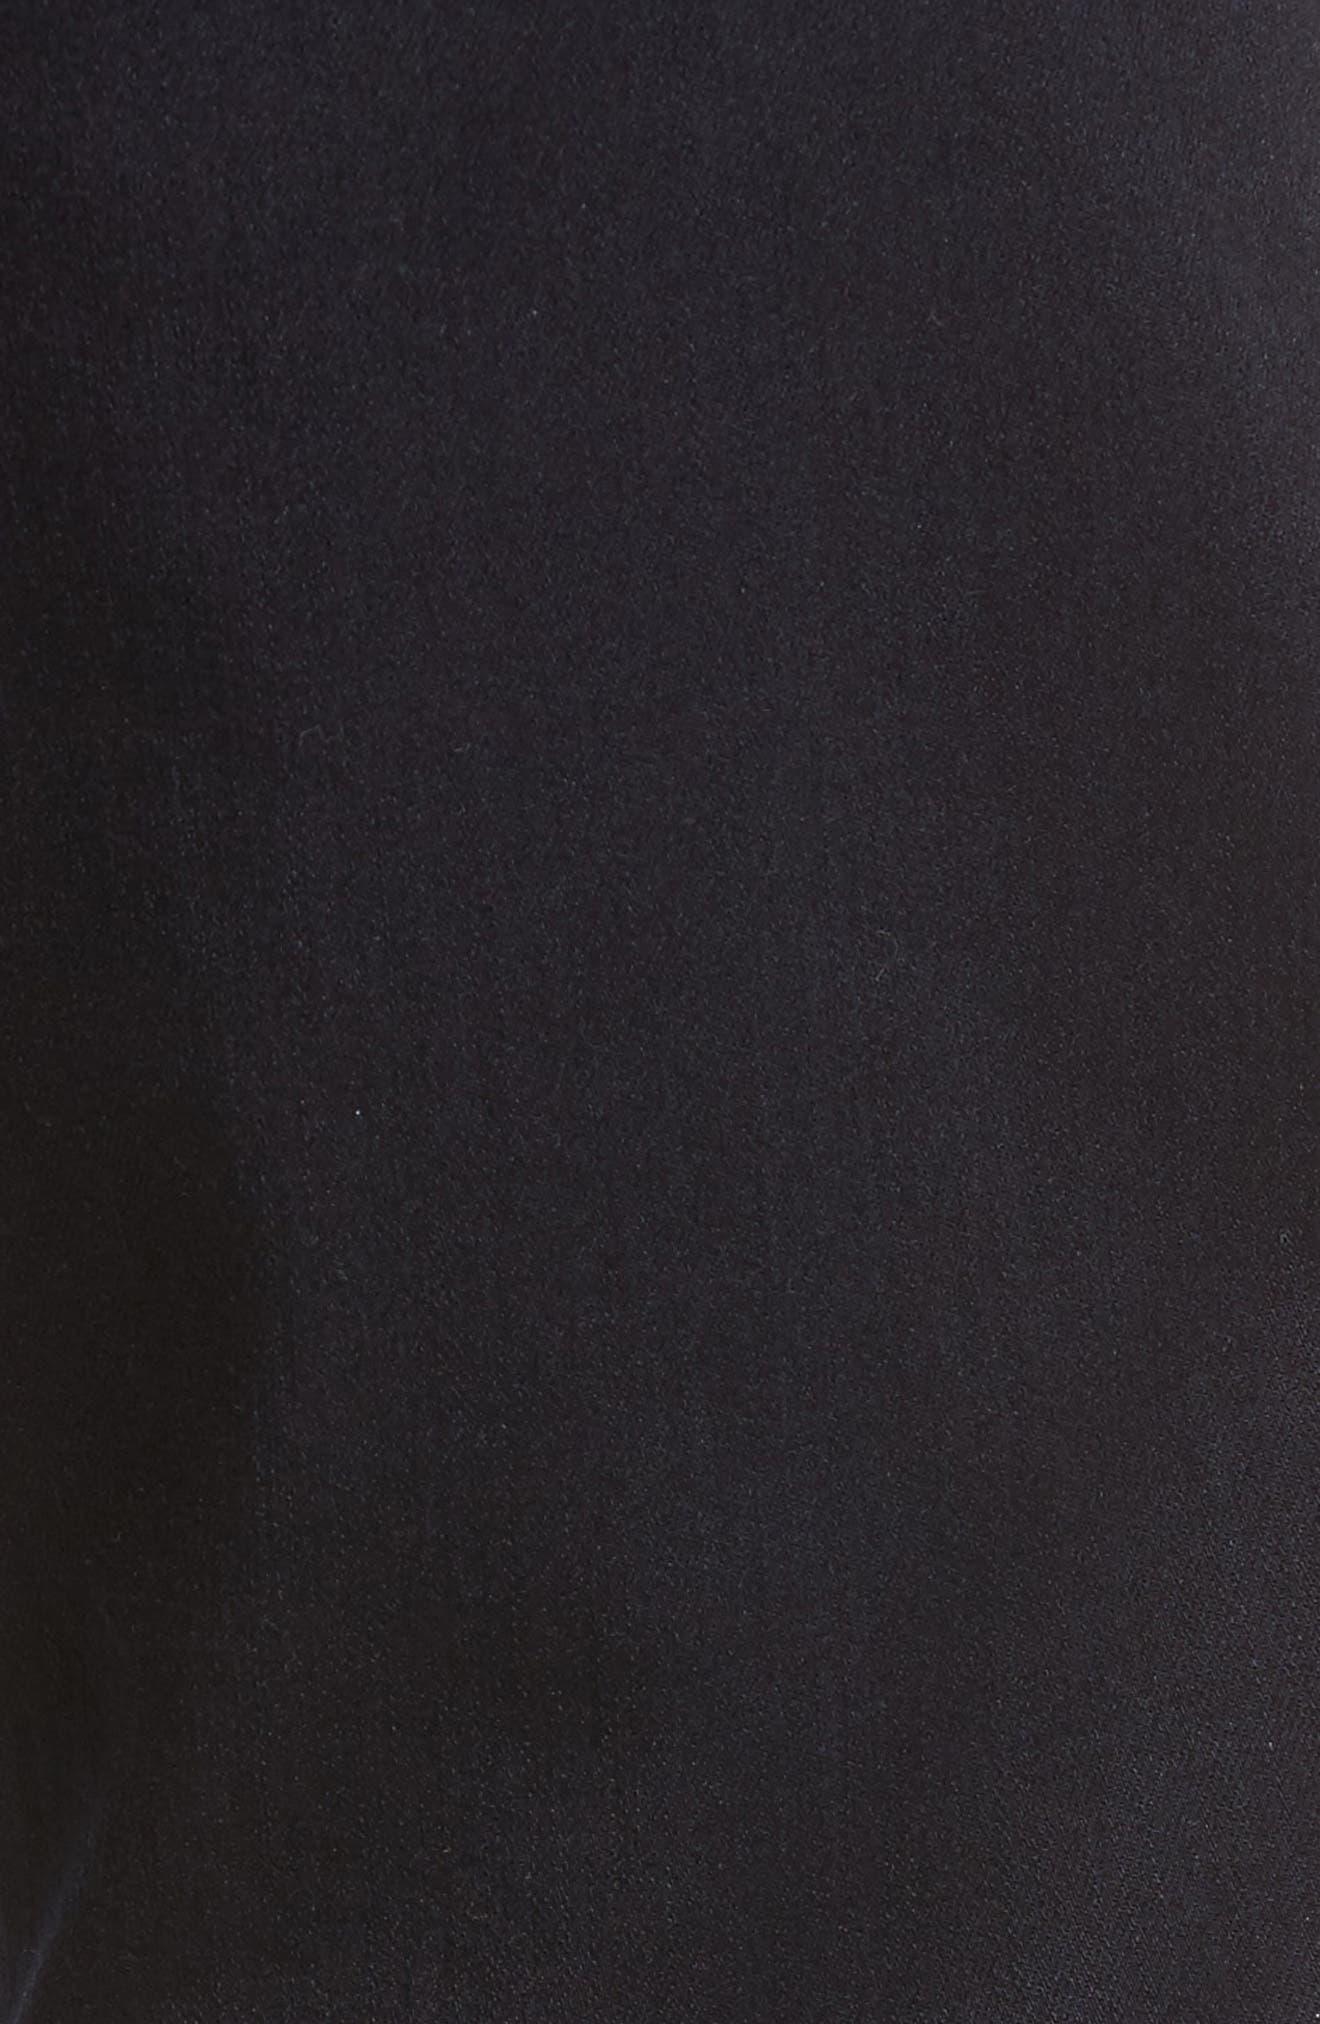 Blake Slim Fit Jeans,                             Alternate thumbnail 14, color,